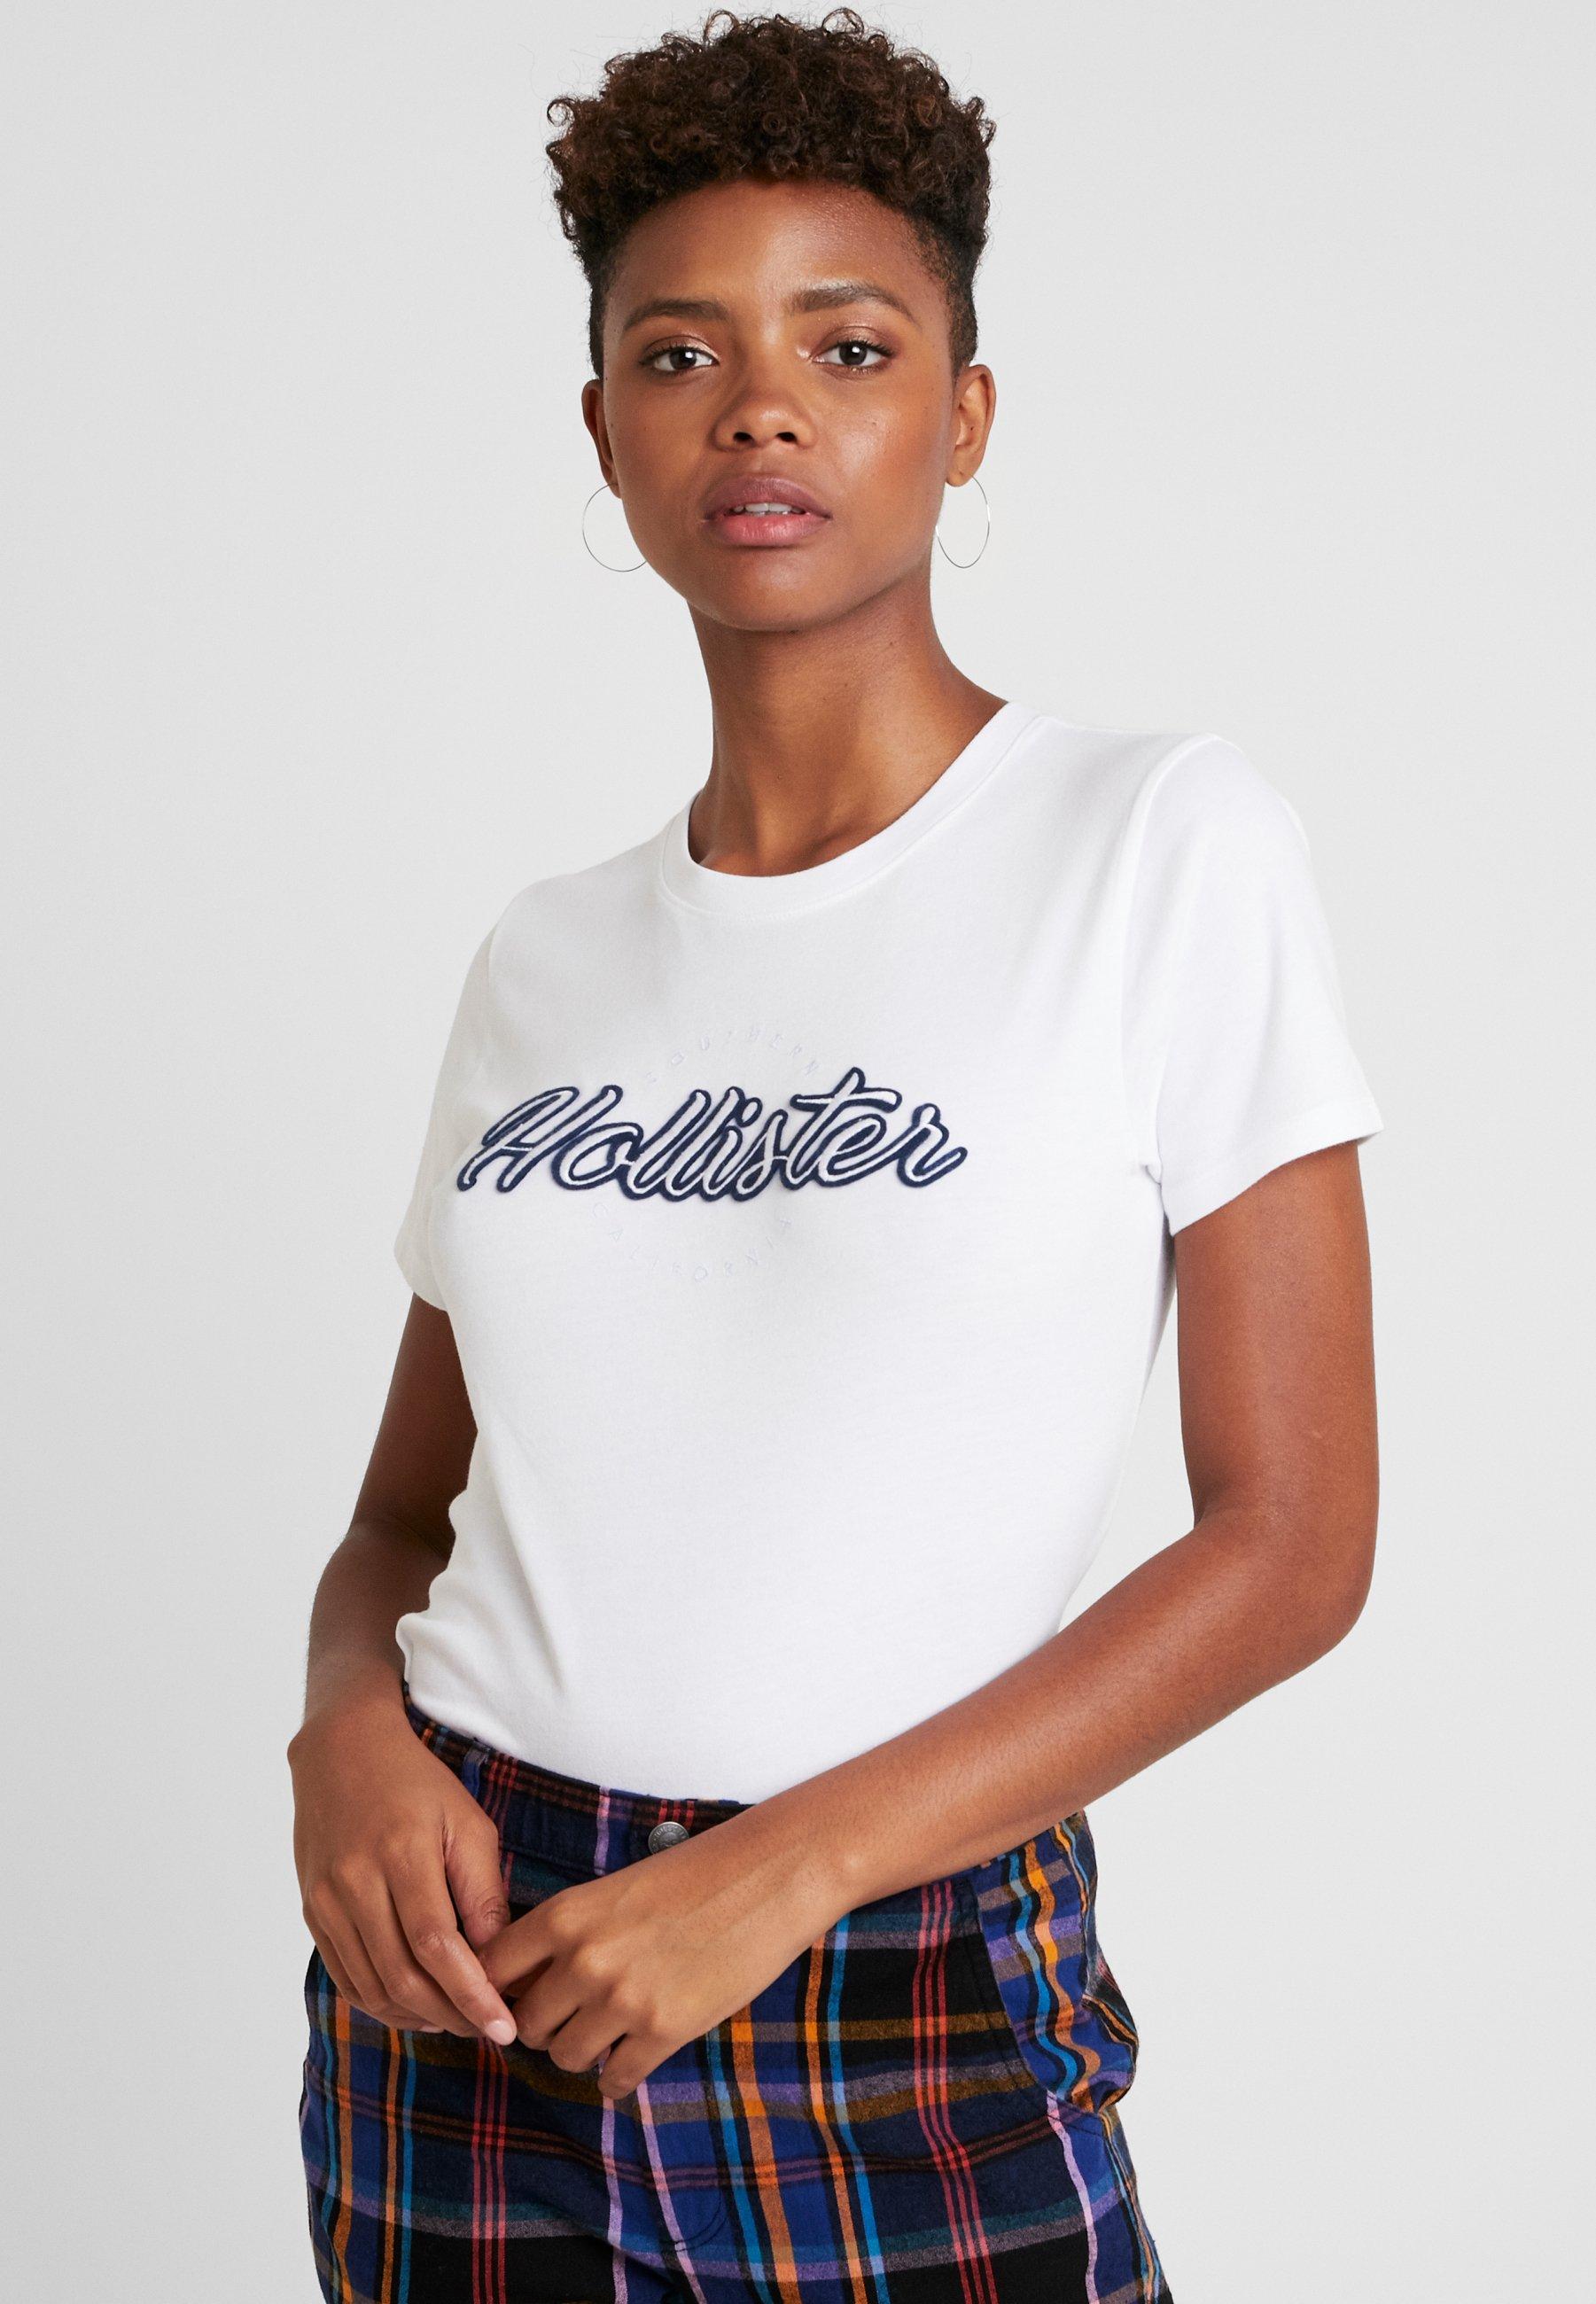 Logo White shirt Hollister TeeT CoCore Imprimé XikOZwPTul